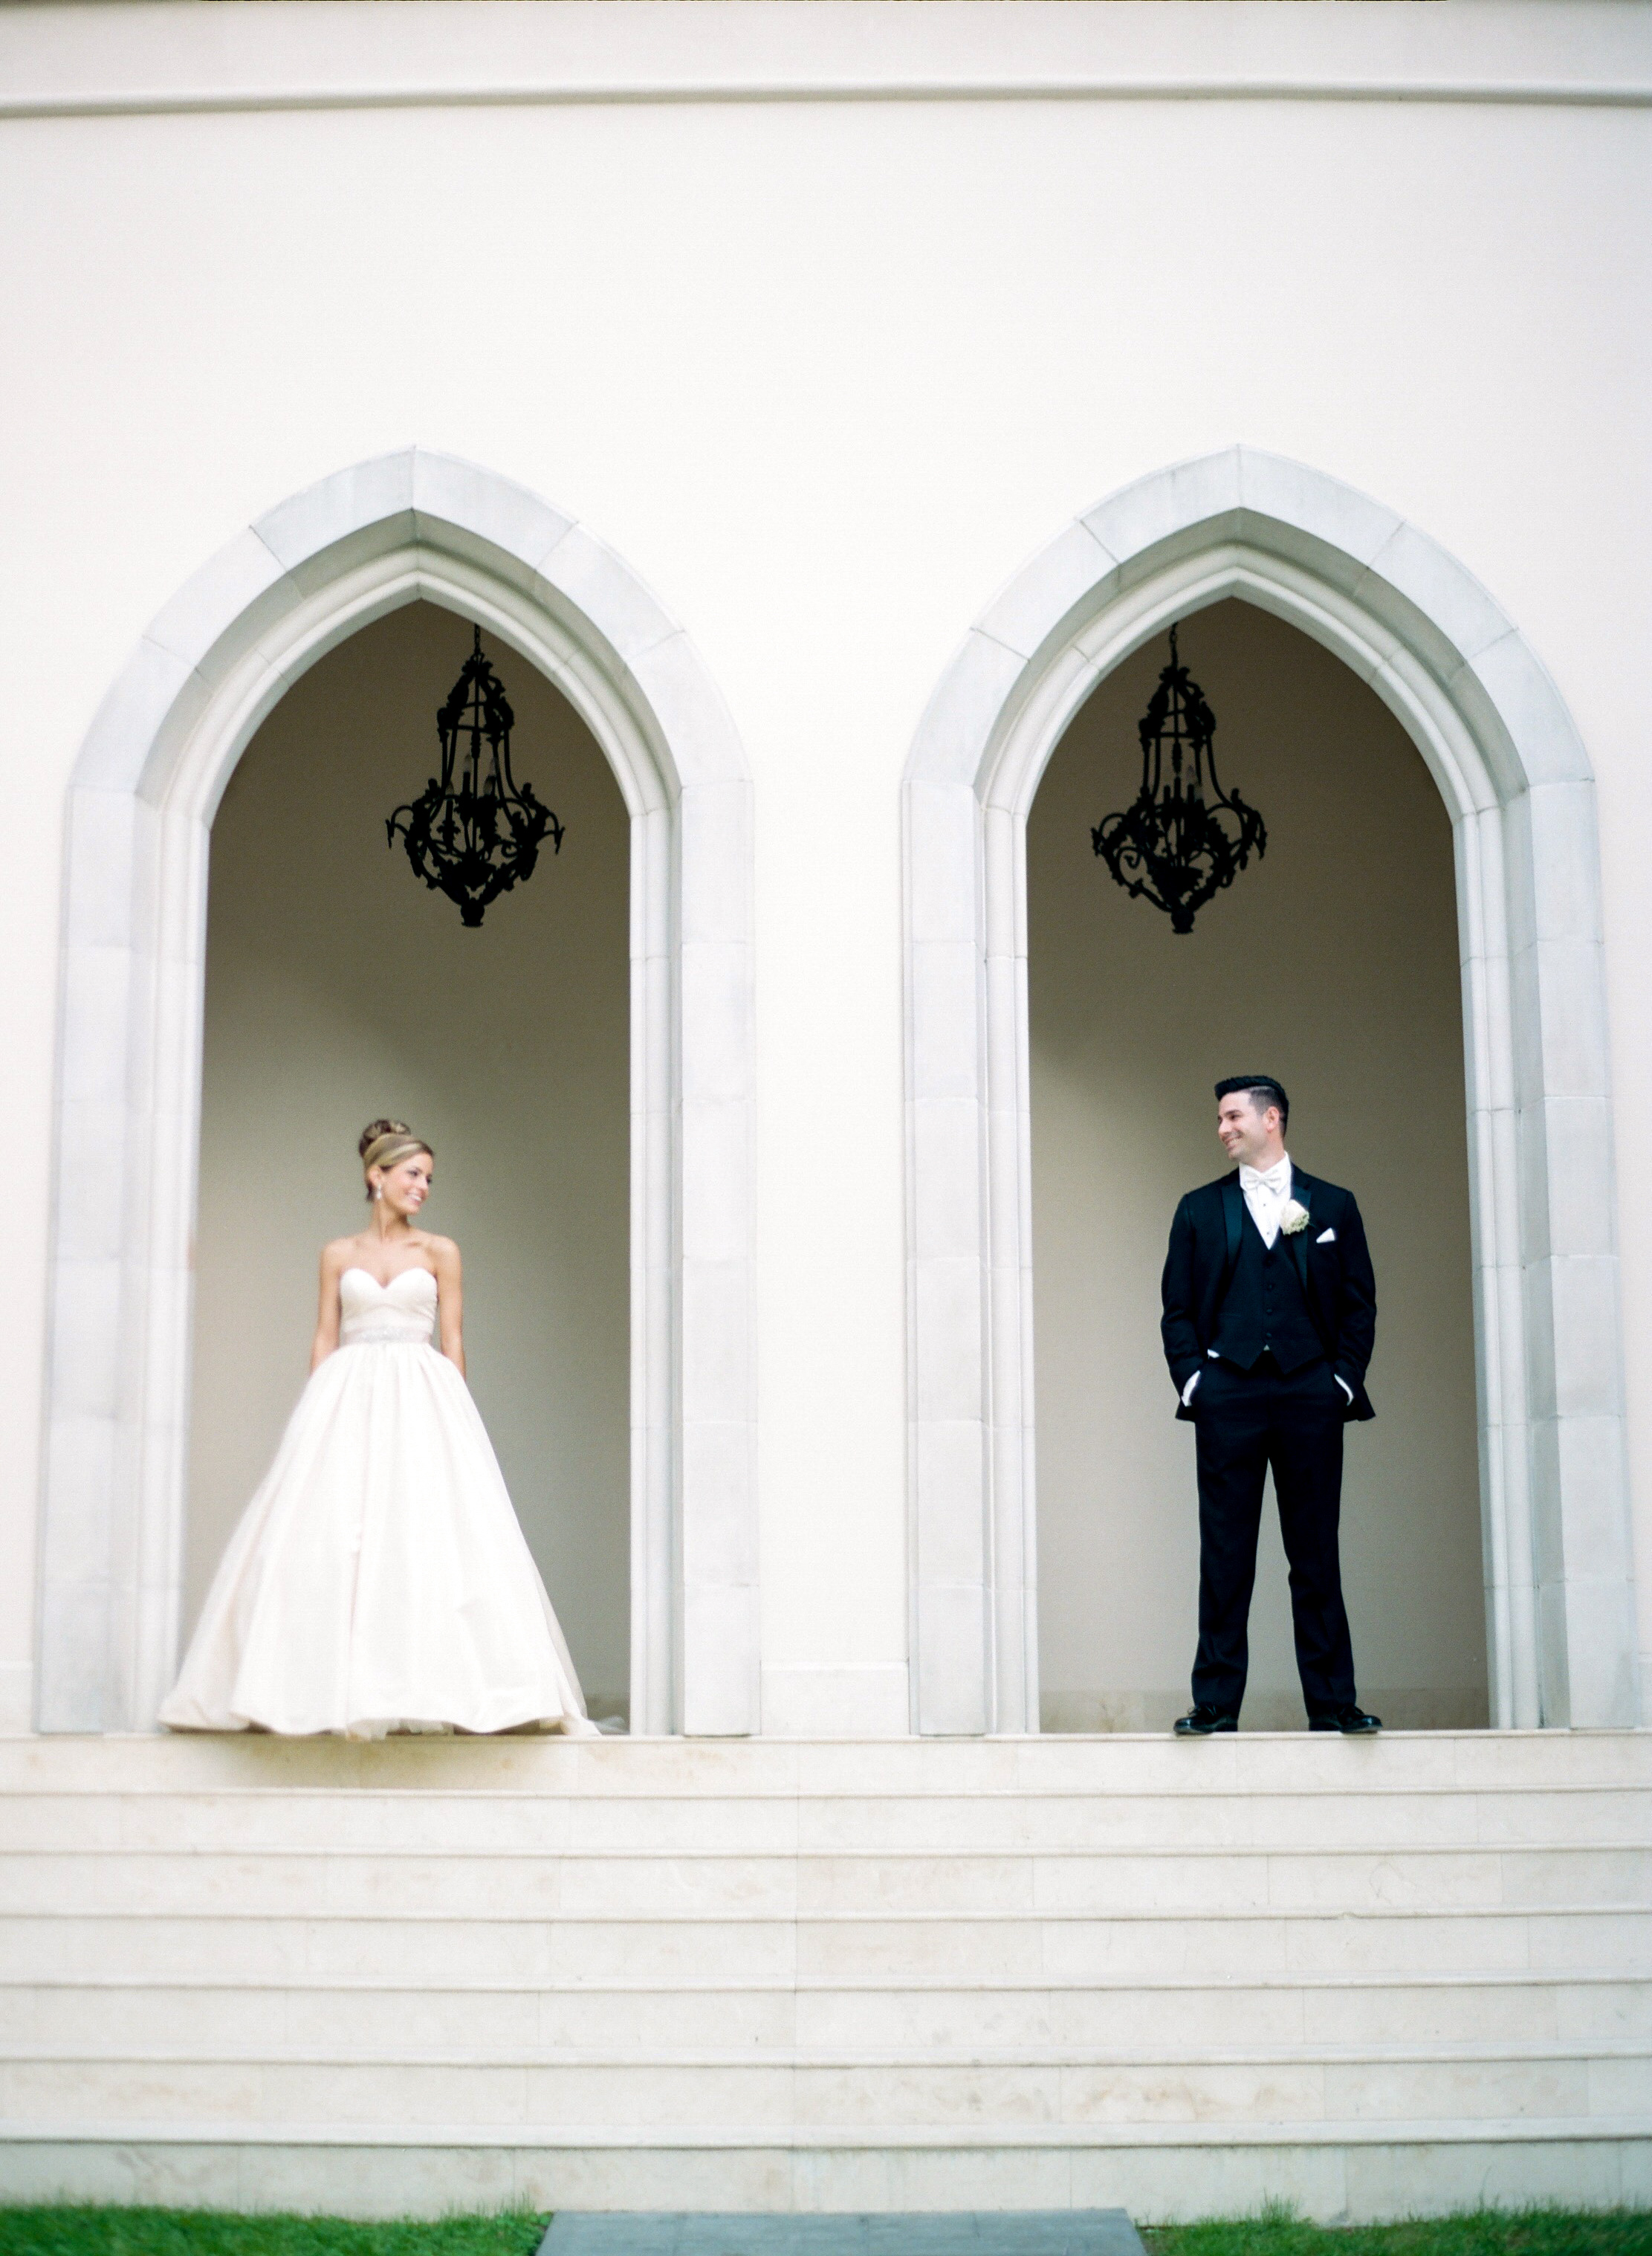 Dana-Fernandez-Photography-Houston-Wedding-Photographer-Style-Me-Pretty-Film-Texas-Destination-Photographer-36.jpg